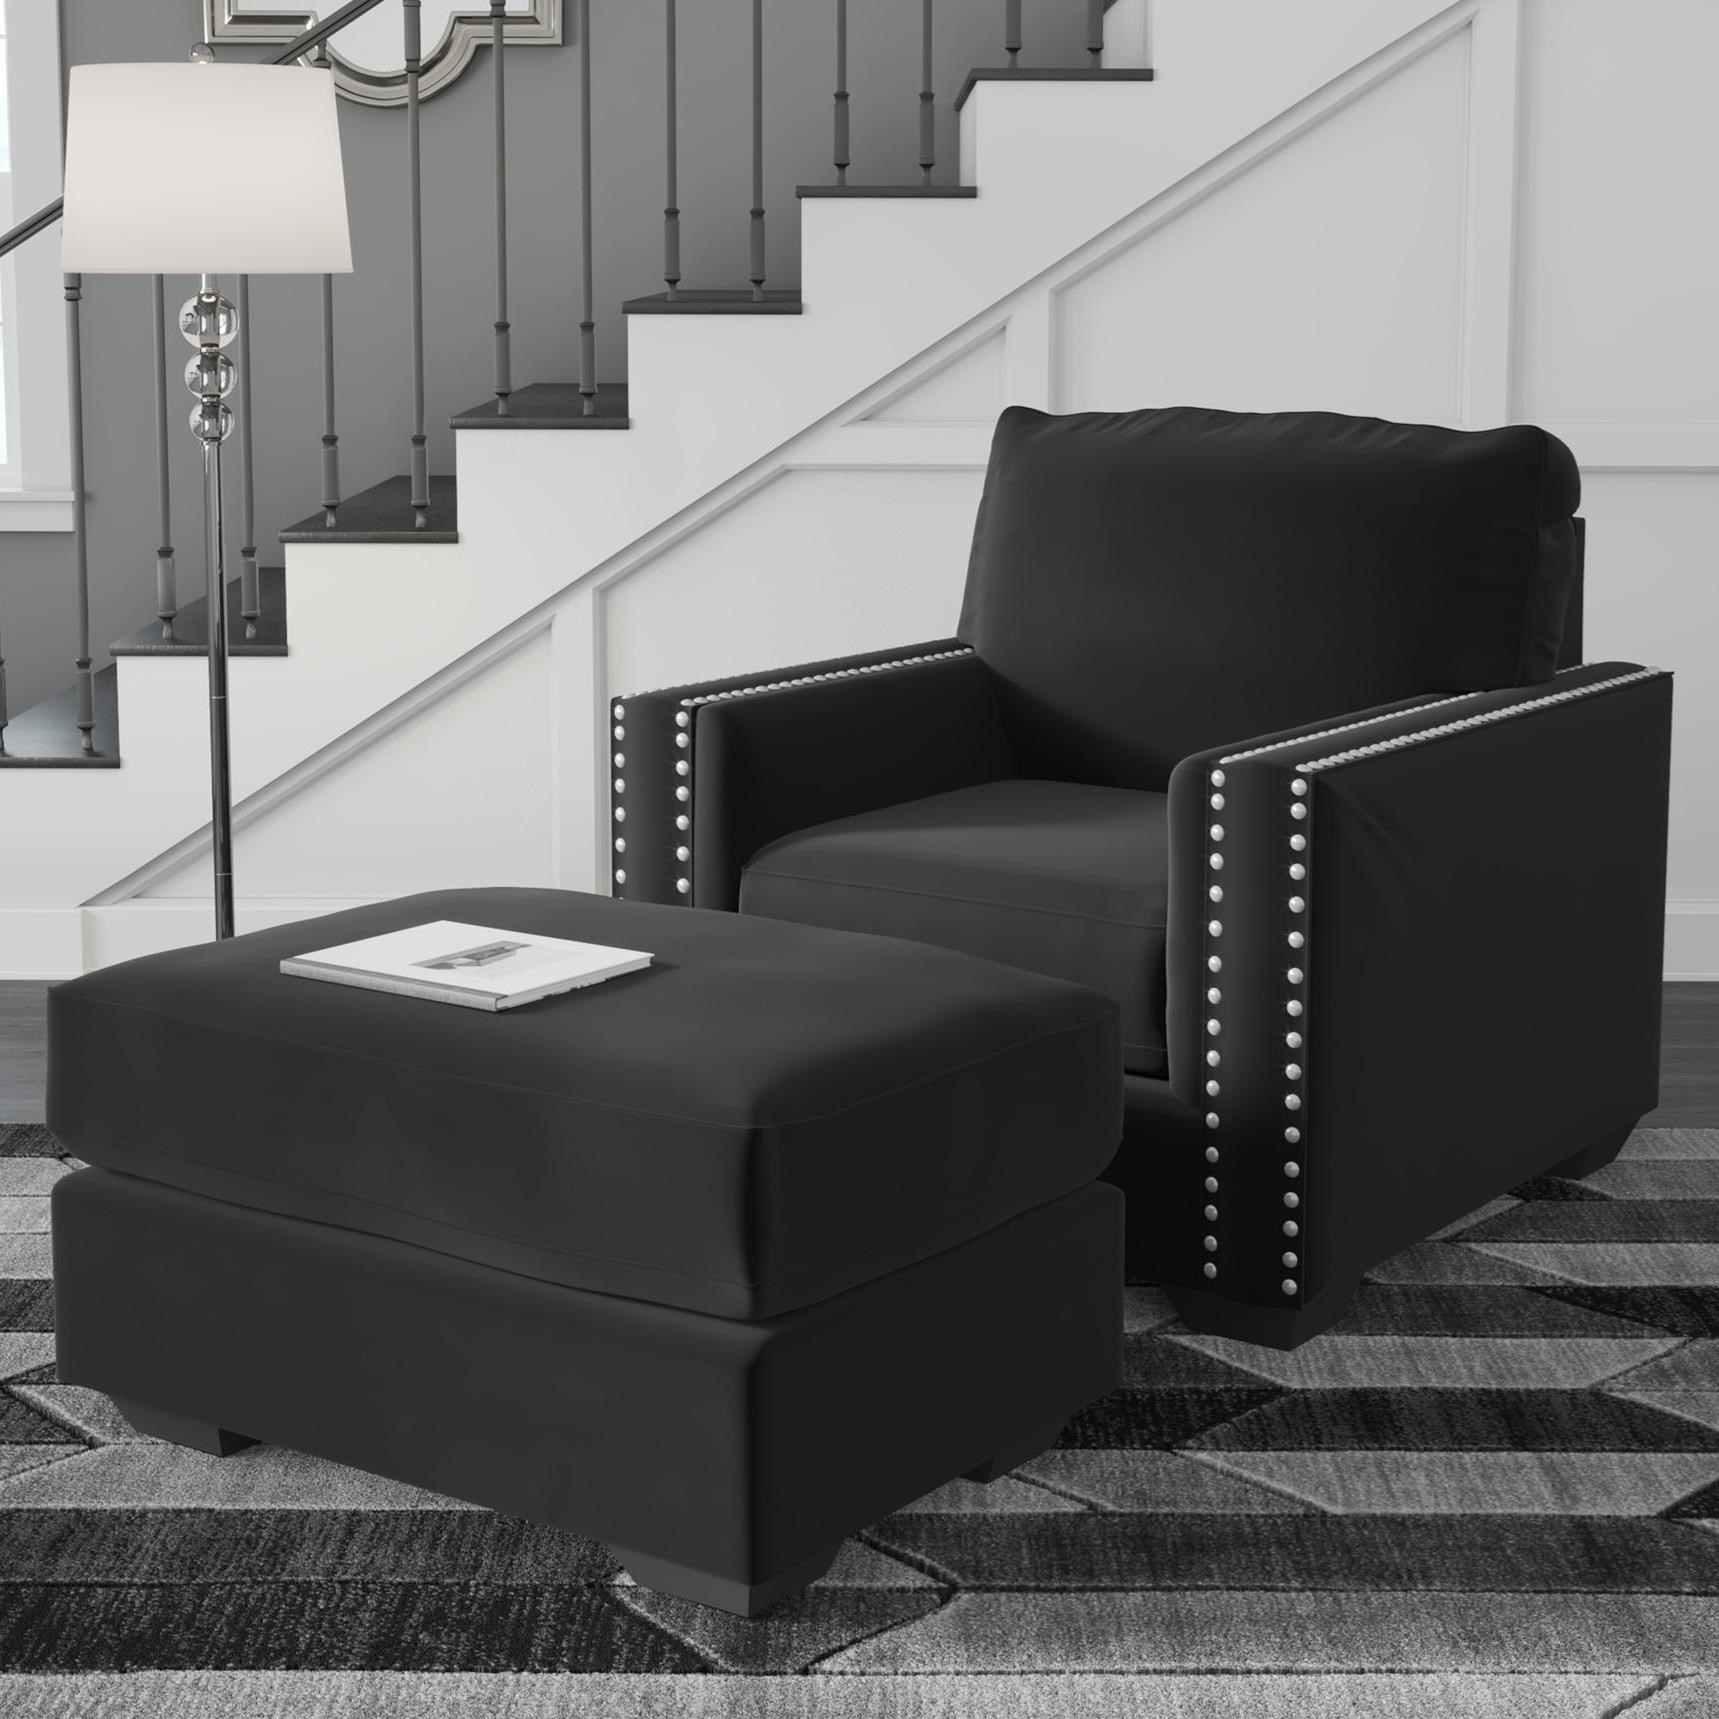 Gleston Chair & Ottoman by Ashley (Signature Design) at Johnny Janosik